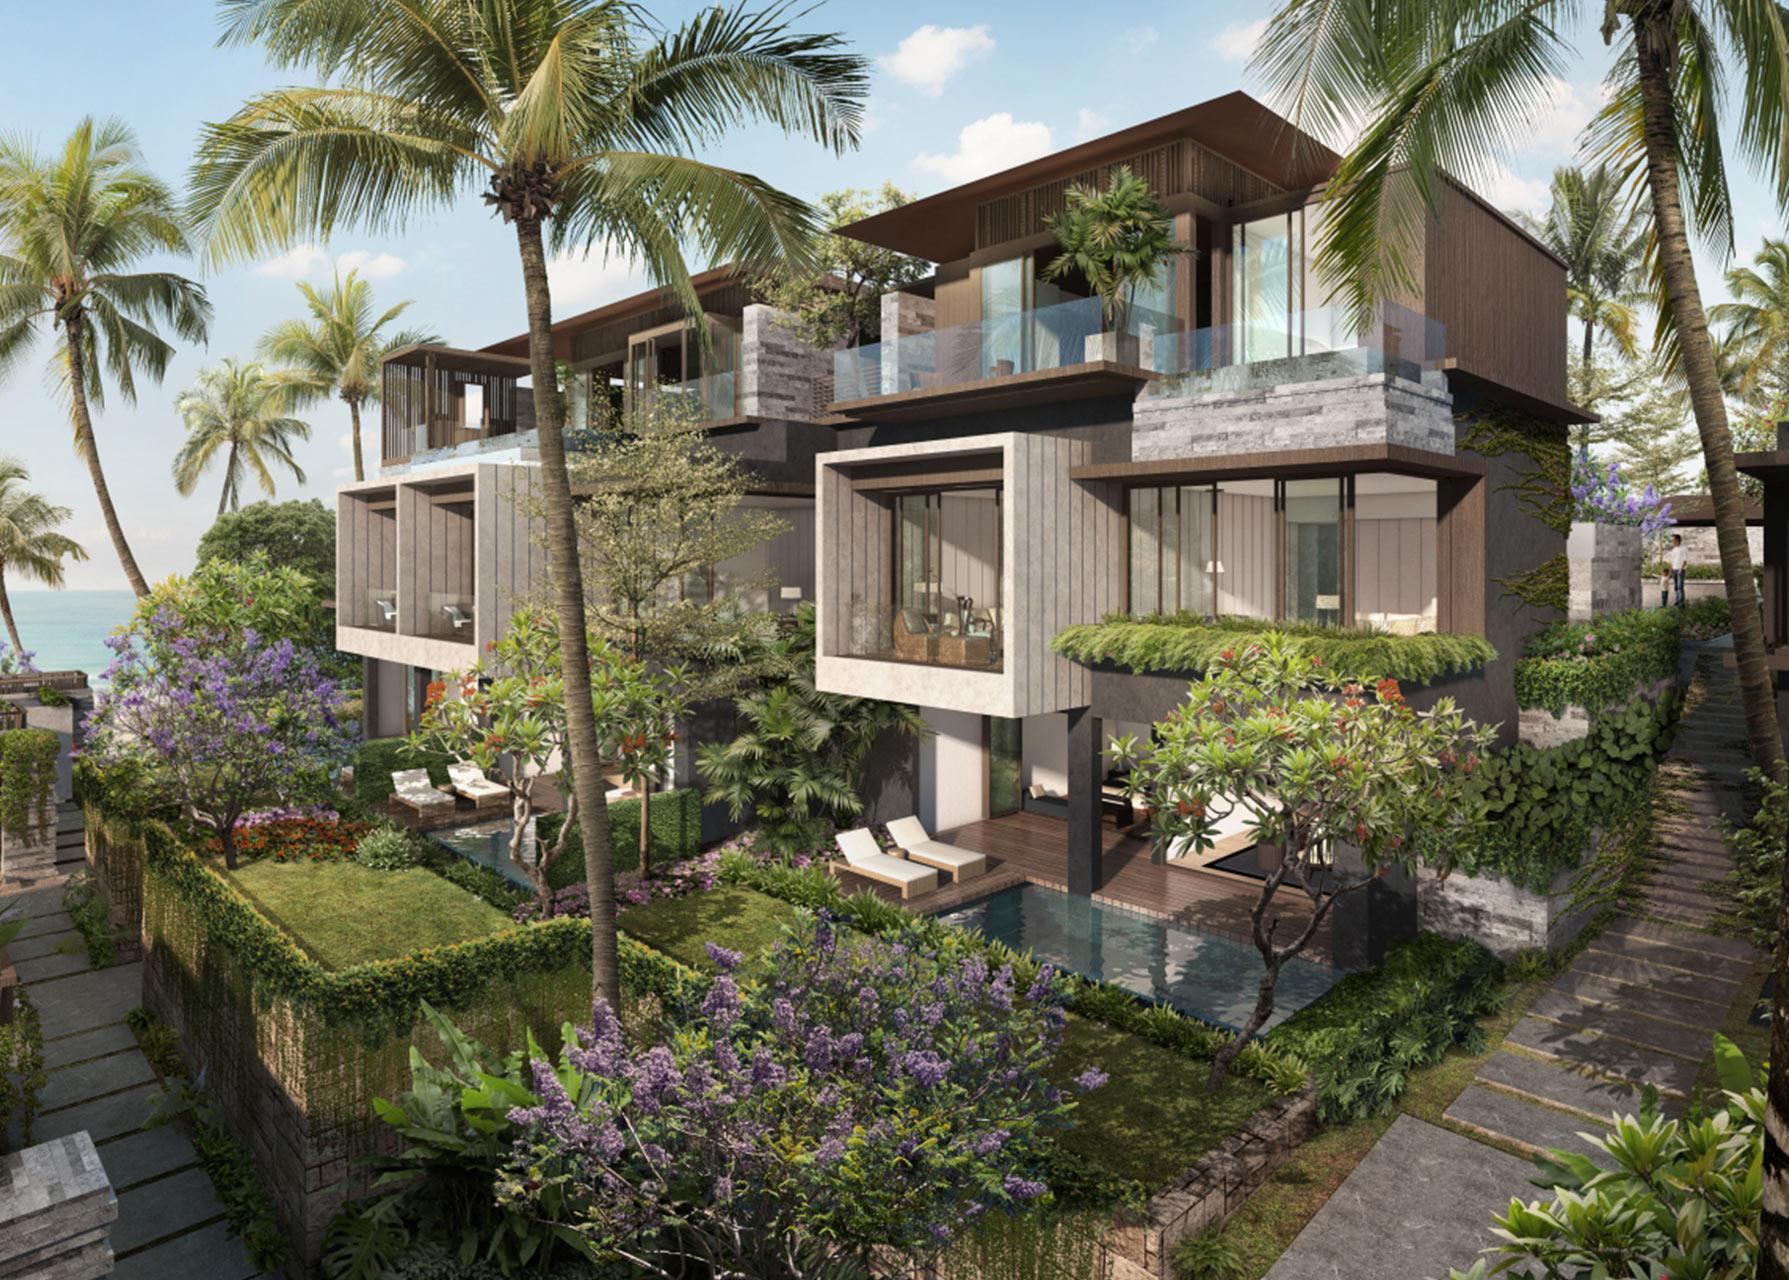 Rosewood Tanah Lot - Bali Indonesia WATG Beach Tall